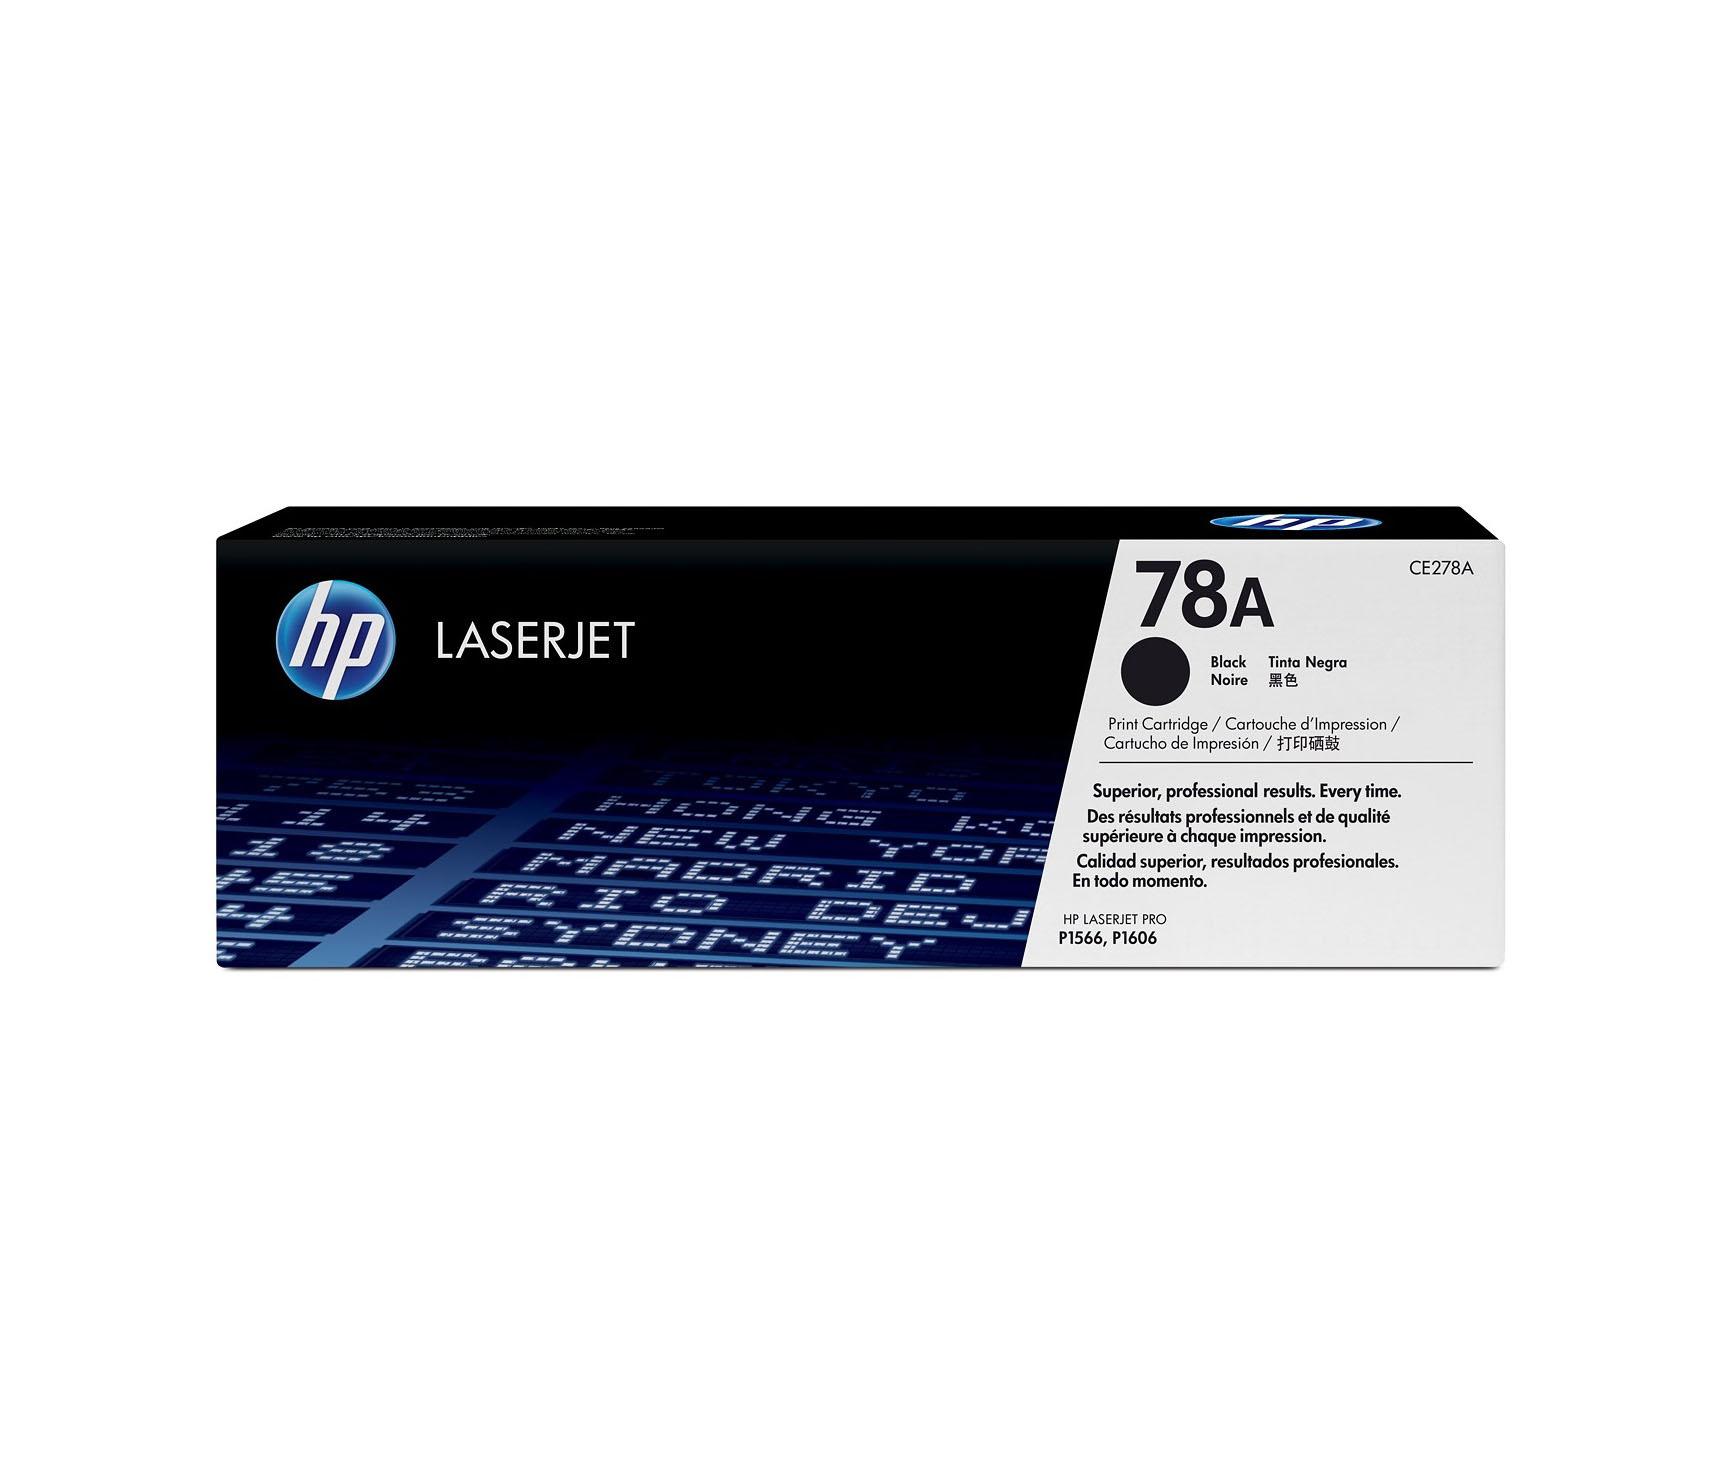 HP CE278A Original Black Toner Cartridge